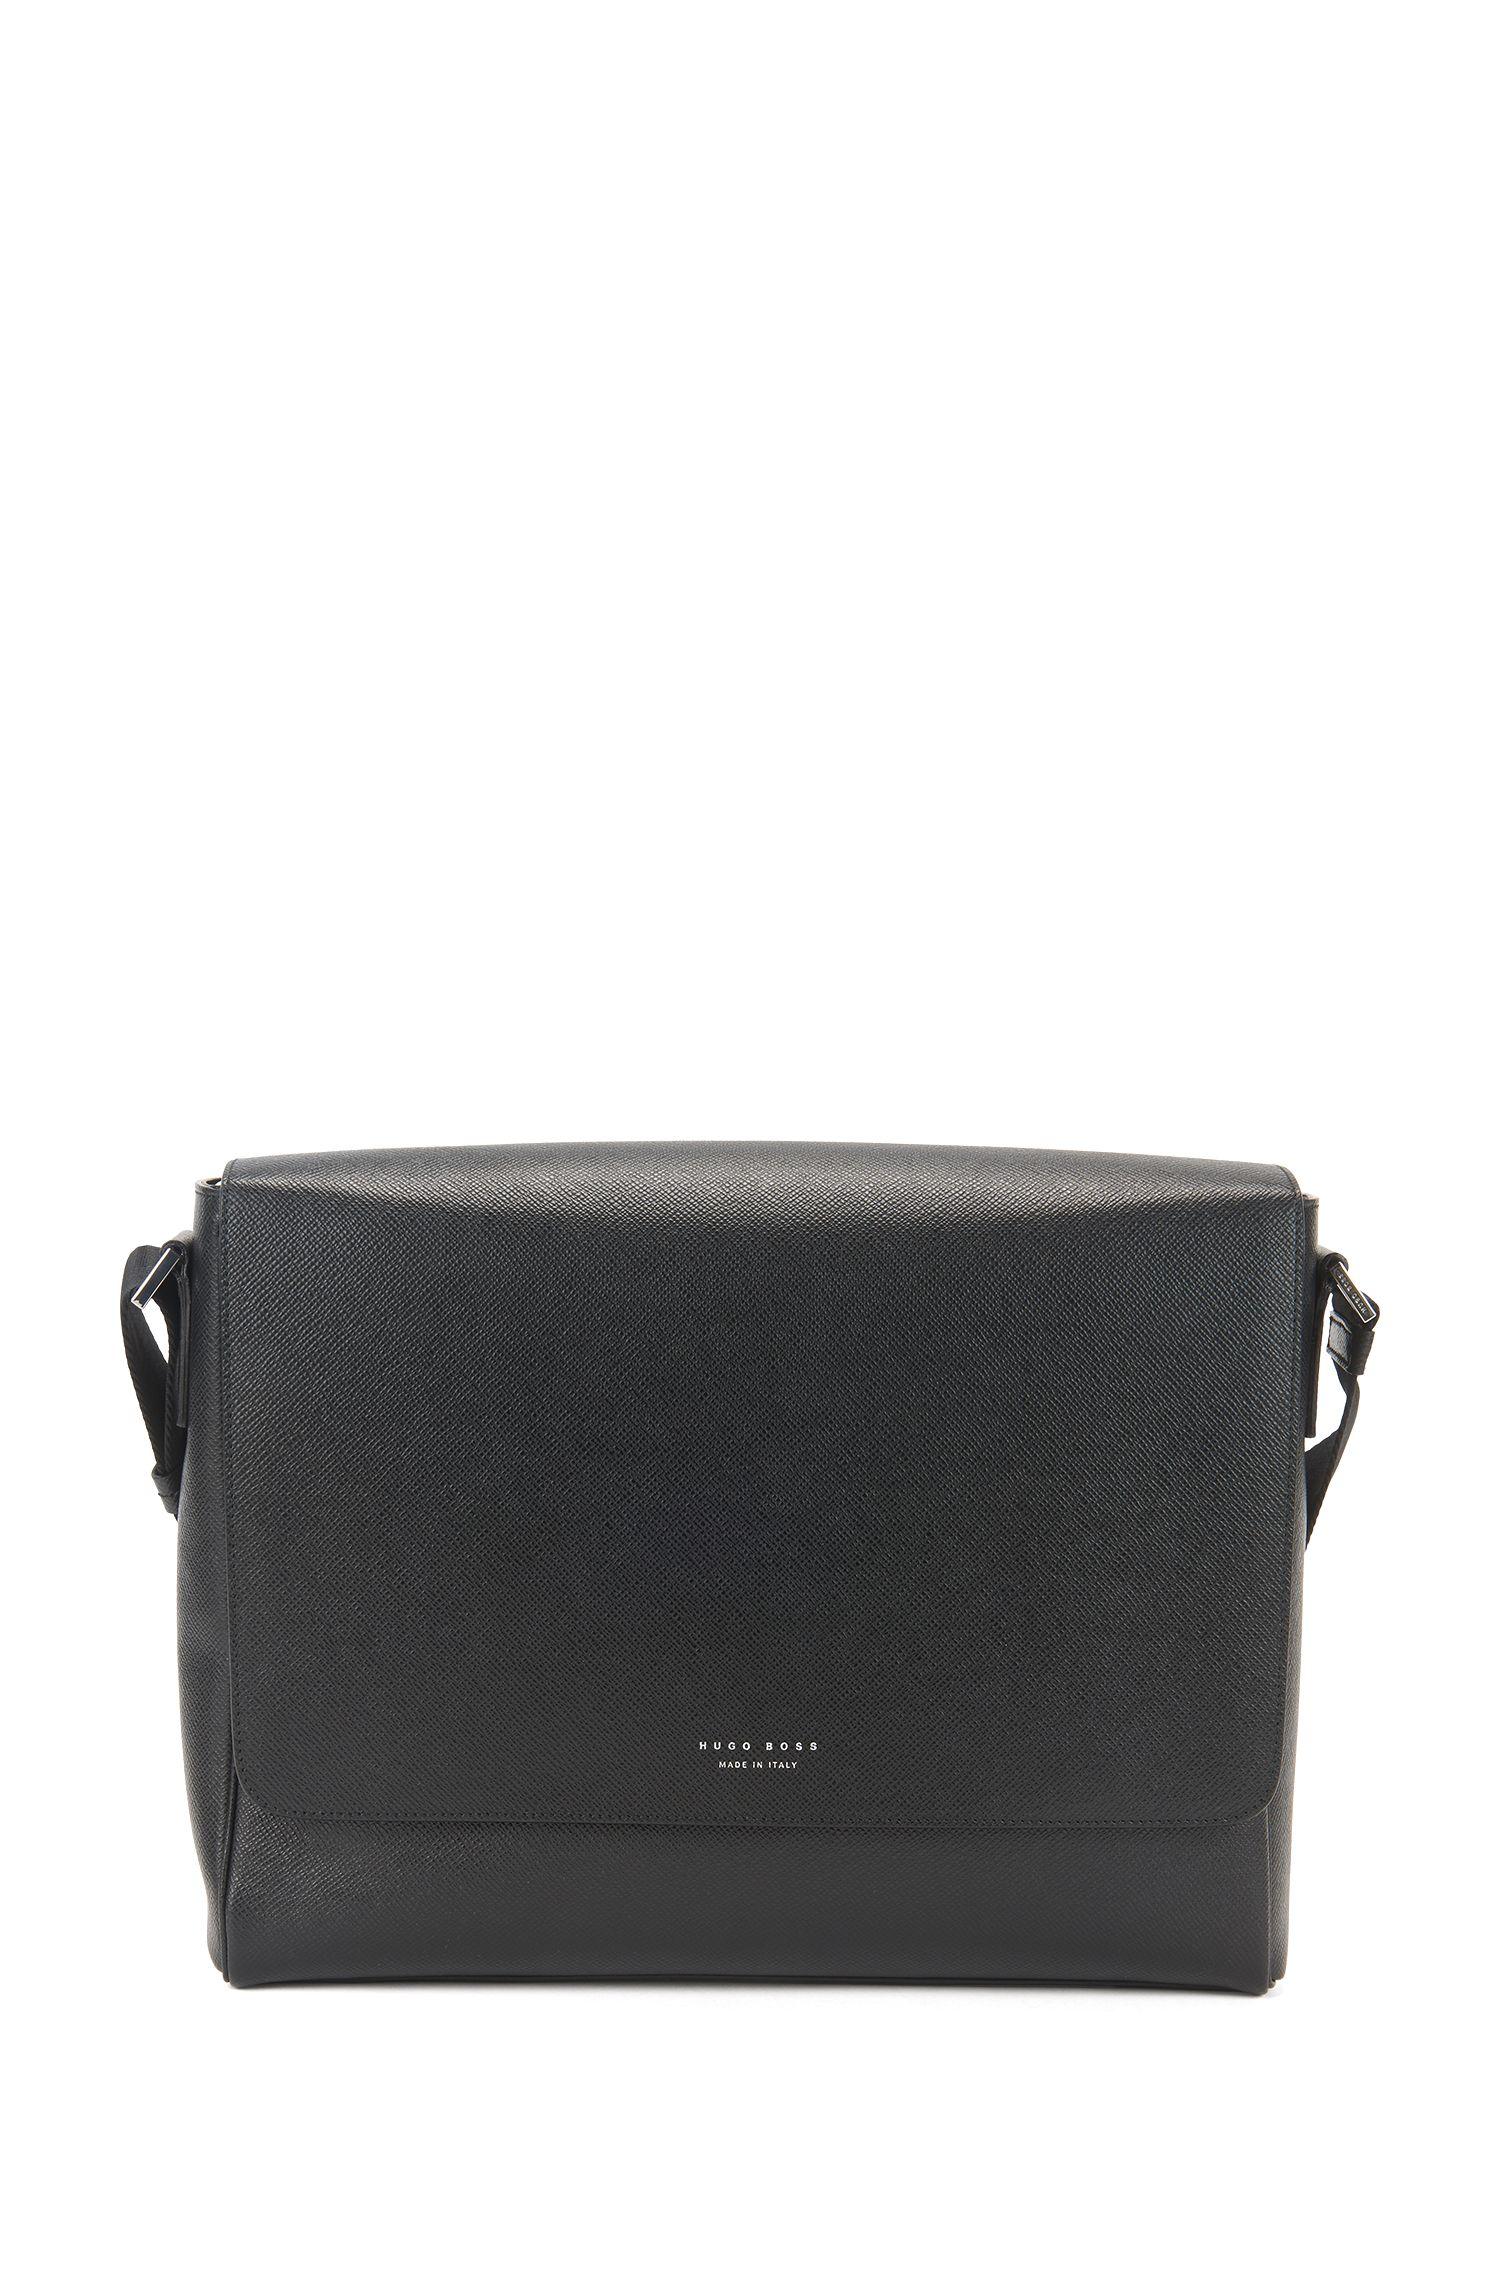 Leather Messenger Bag | Signature Mess Flap